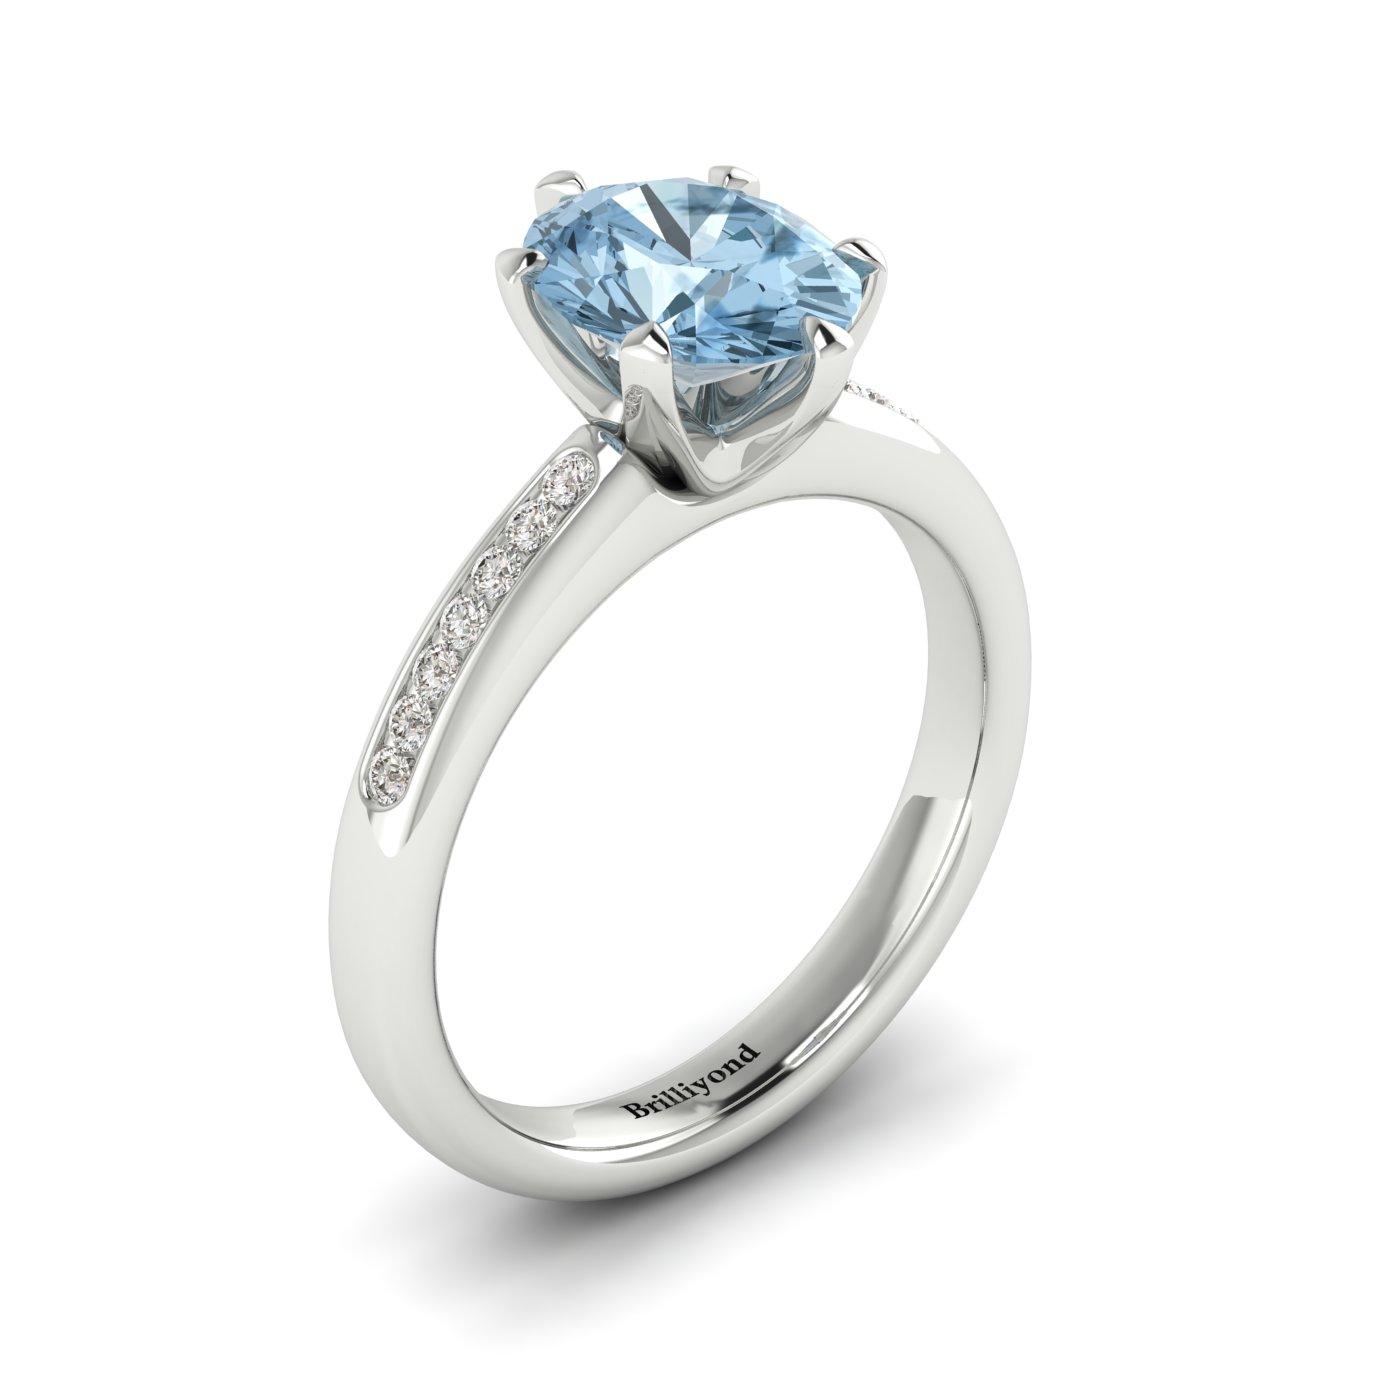 Aquamarine White Gold Oval Engagement Ring Nymph_image1